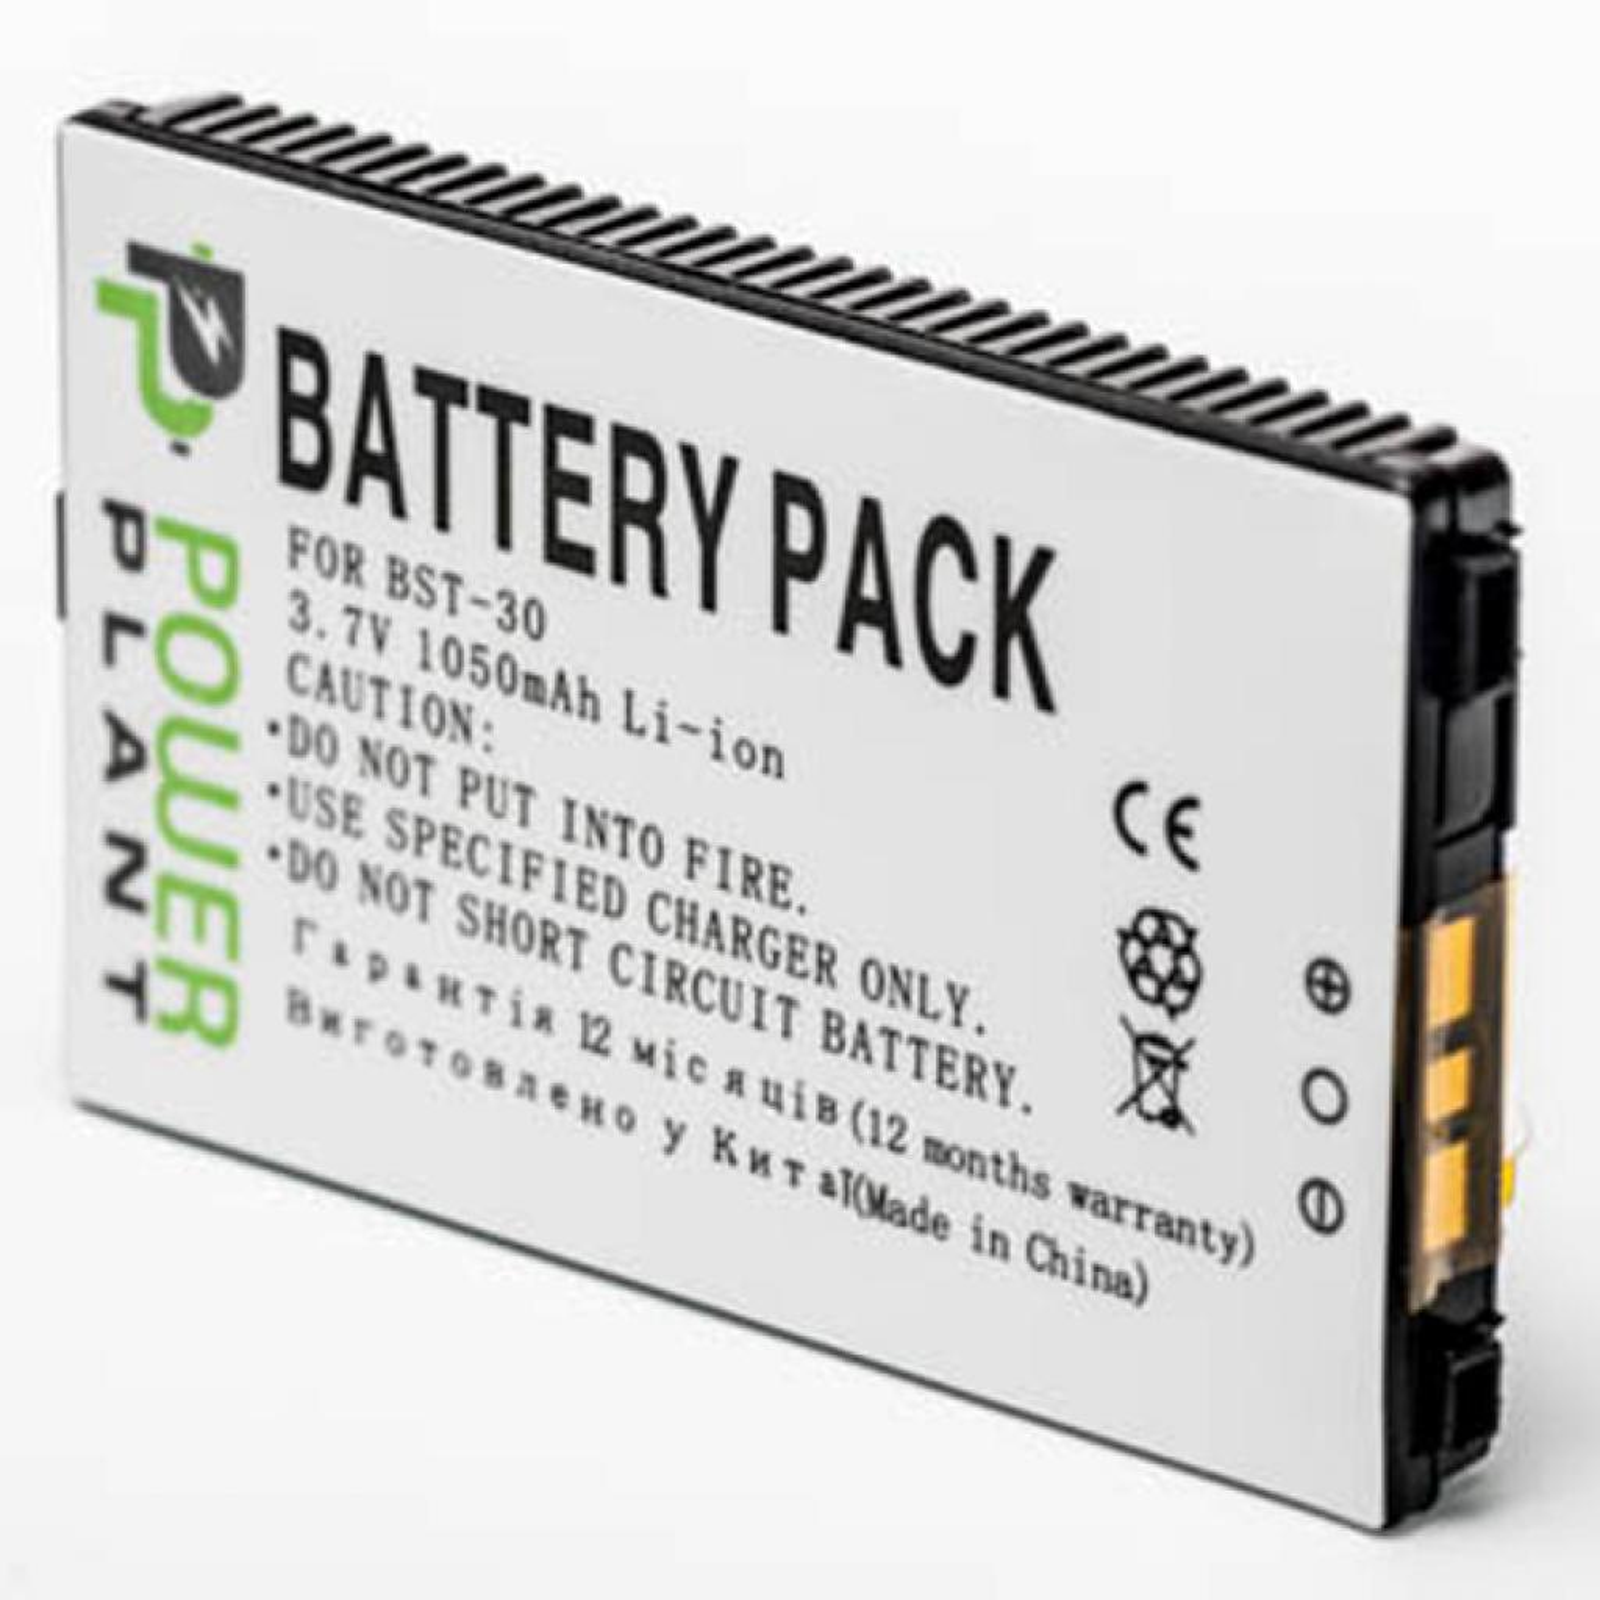 Аккумуляторная батарея PowerPlant Sony Ericsson BST-30 (K300, K500, K700) (DV00DV1111) изображение 2